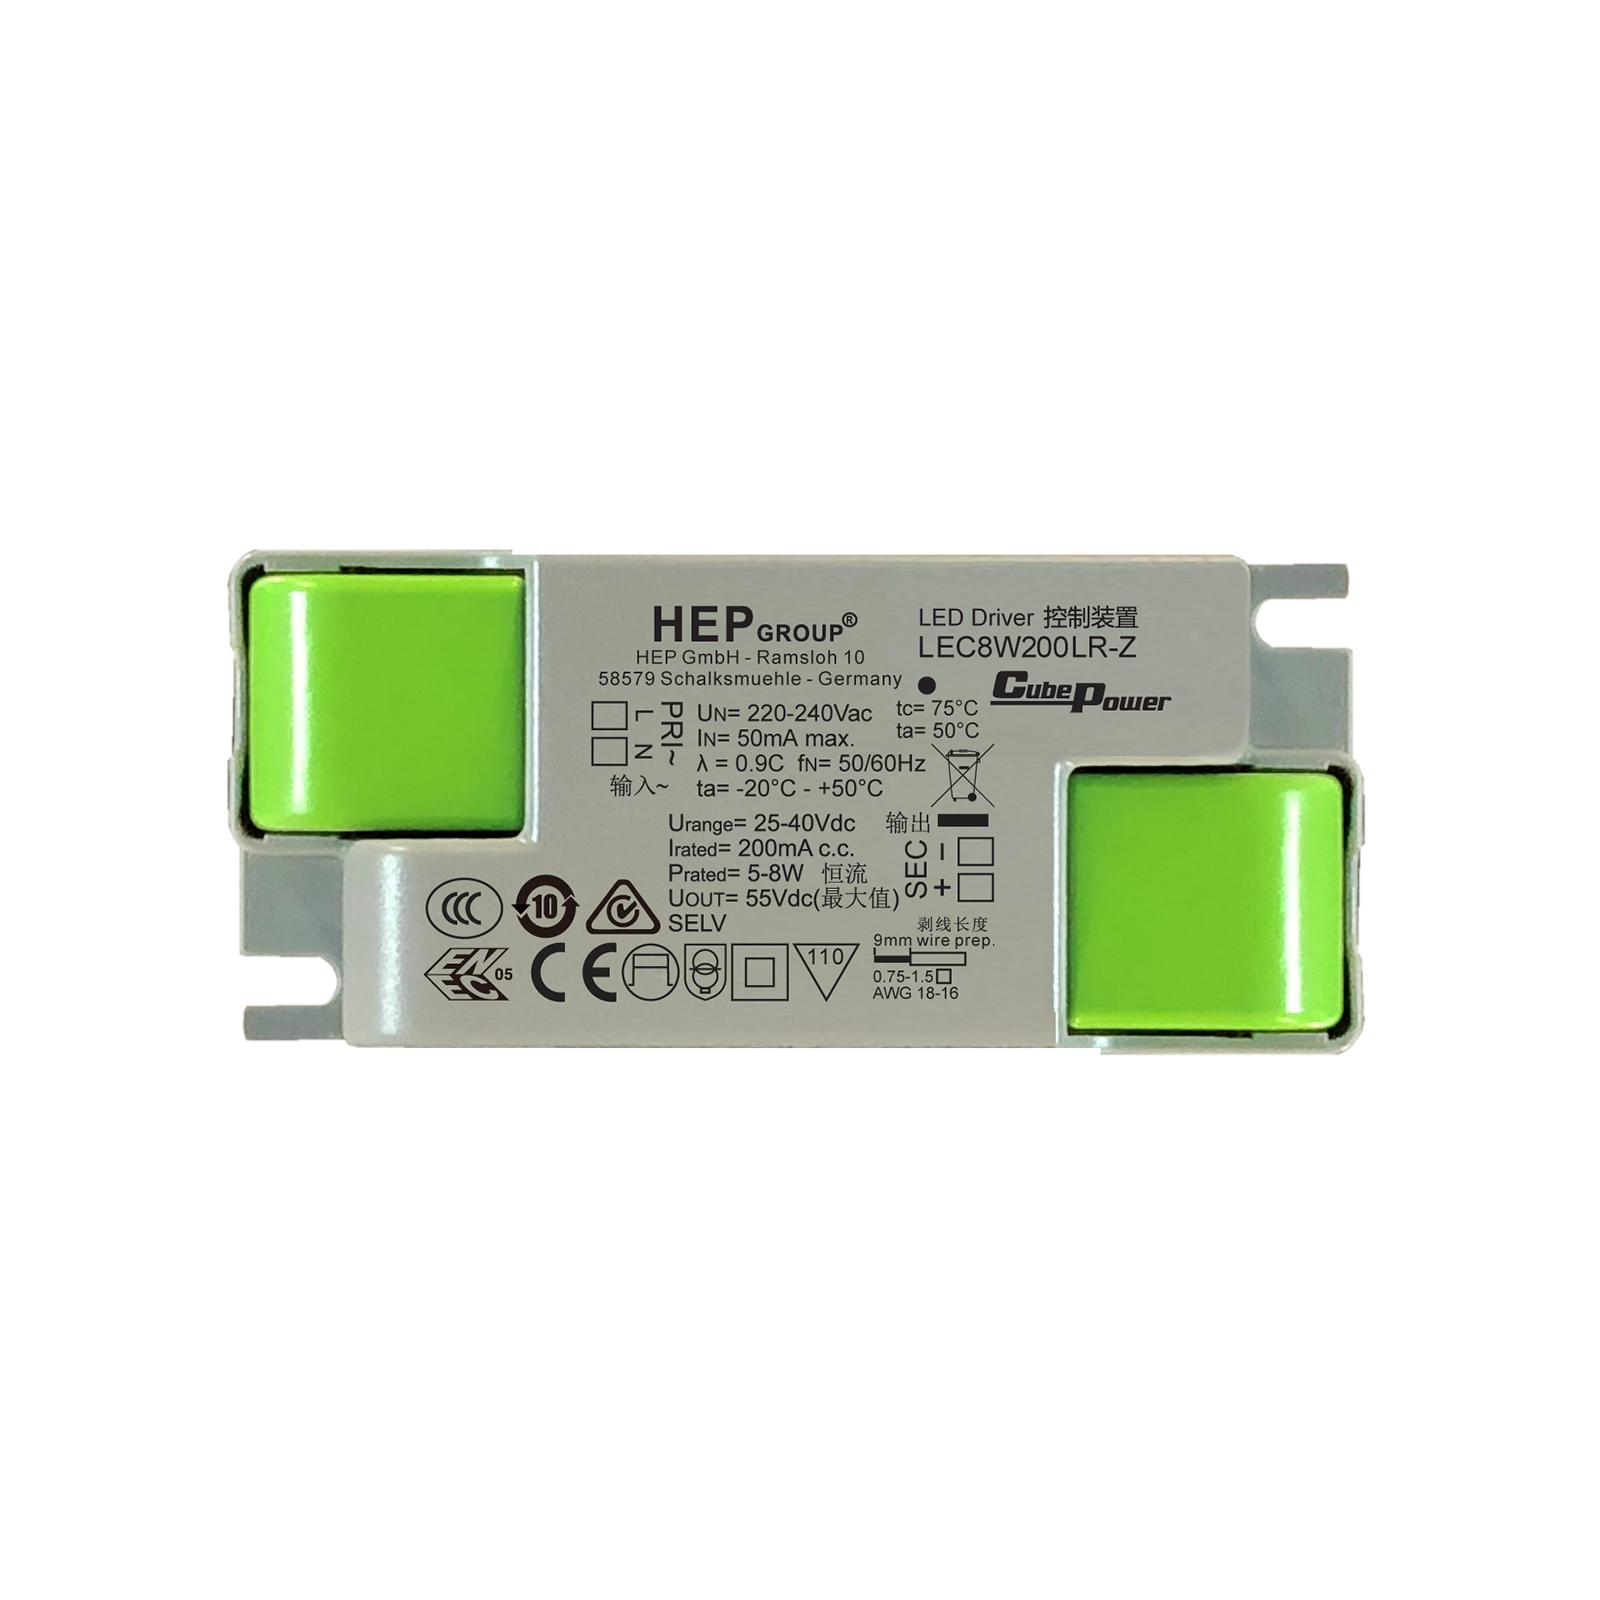 LED-Treiber LEC, 8 W, 200 mA, CC